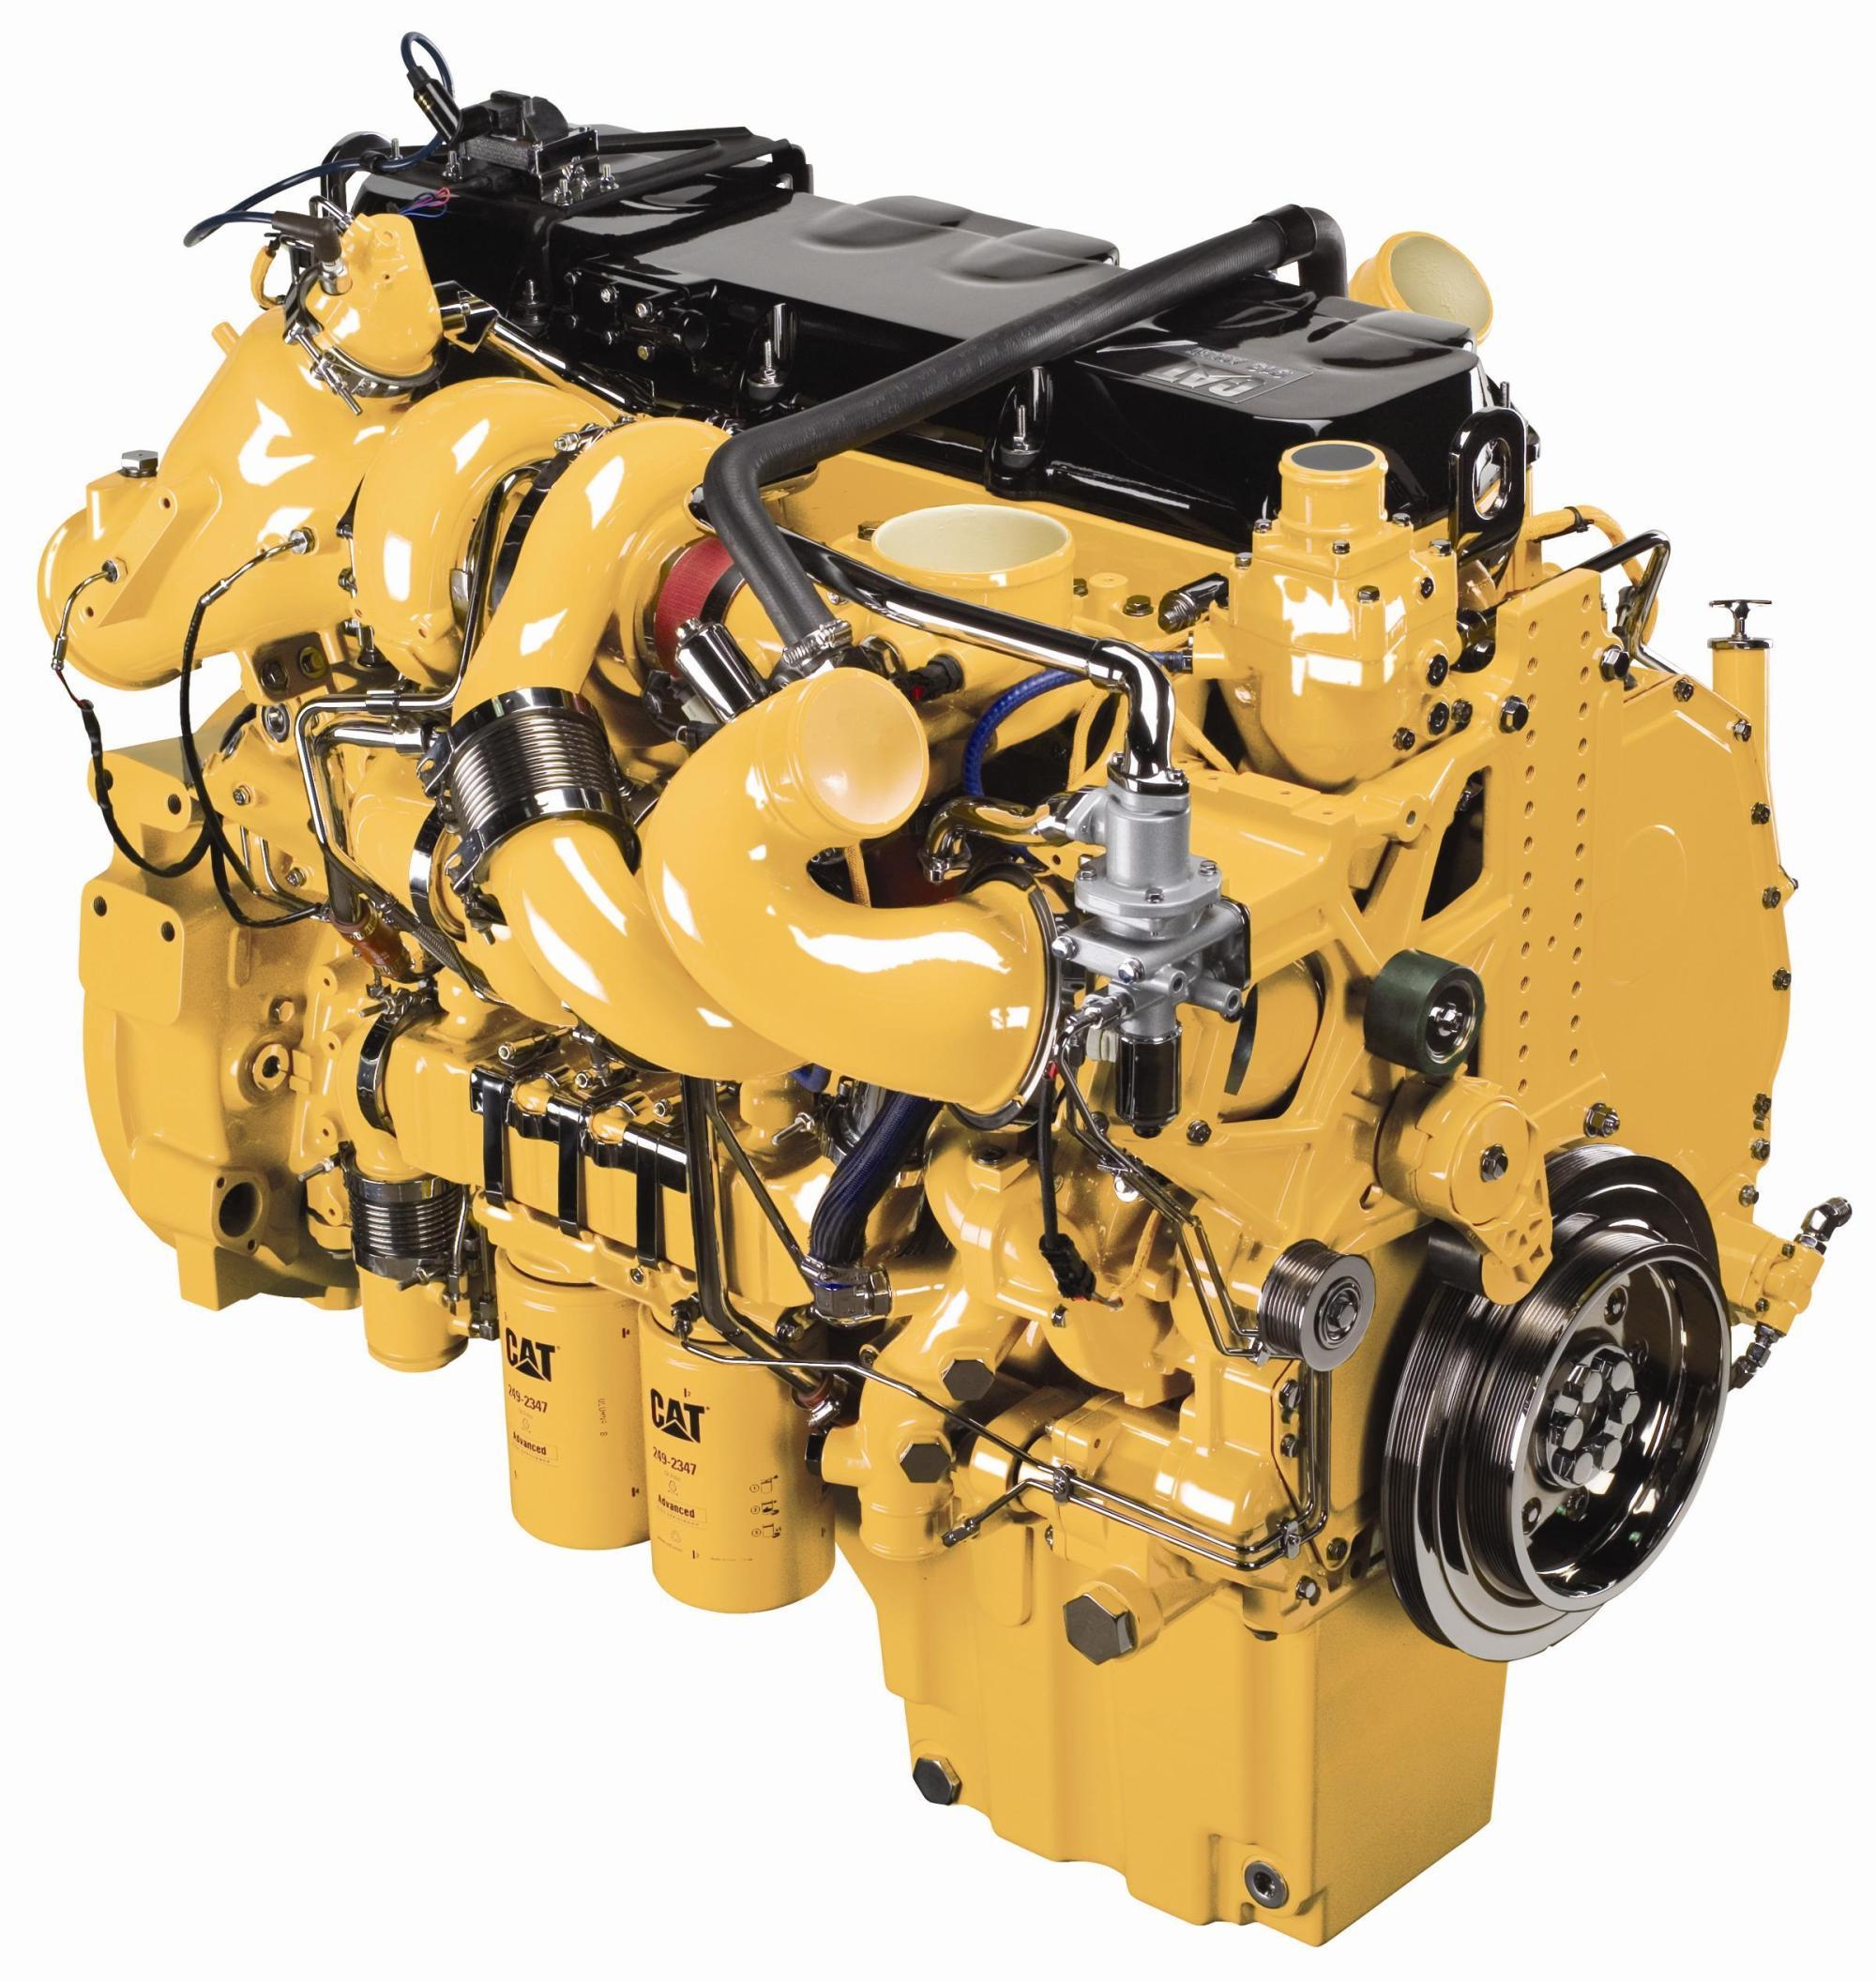 hight resolution of cat c15 engine diagram 2004